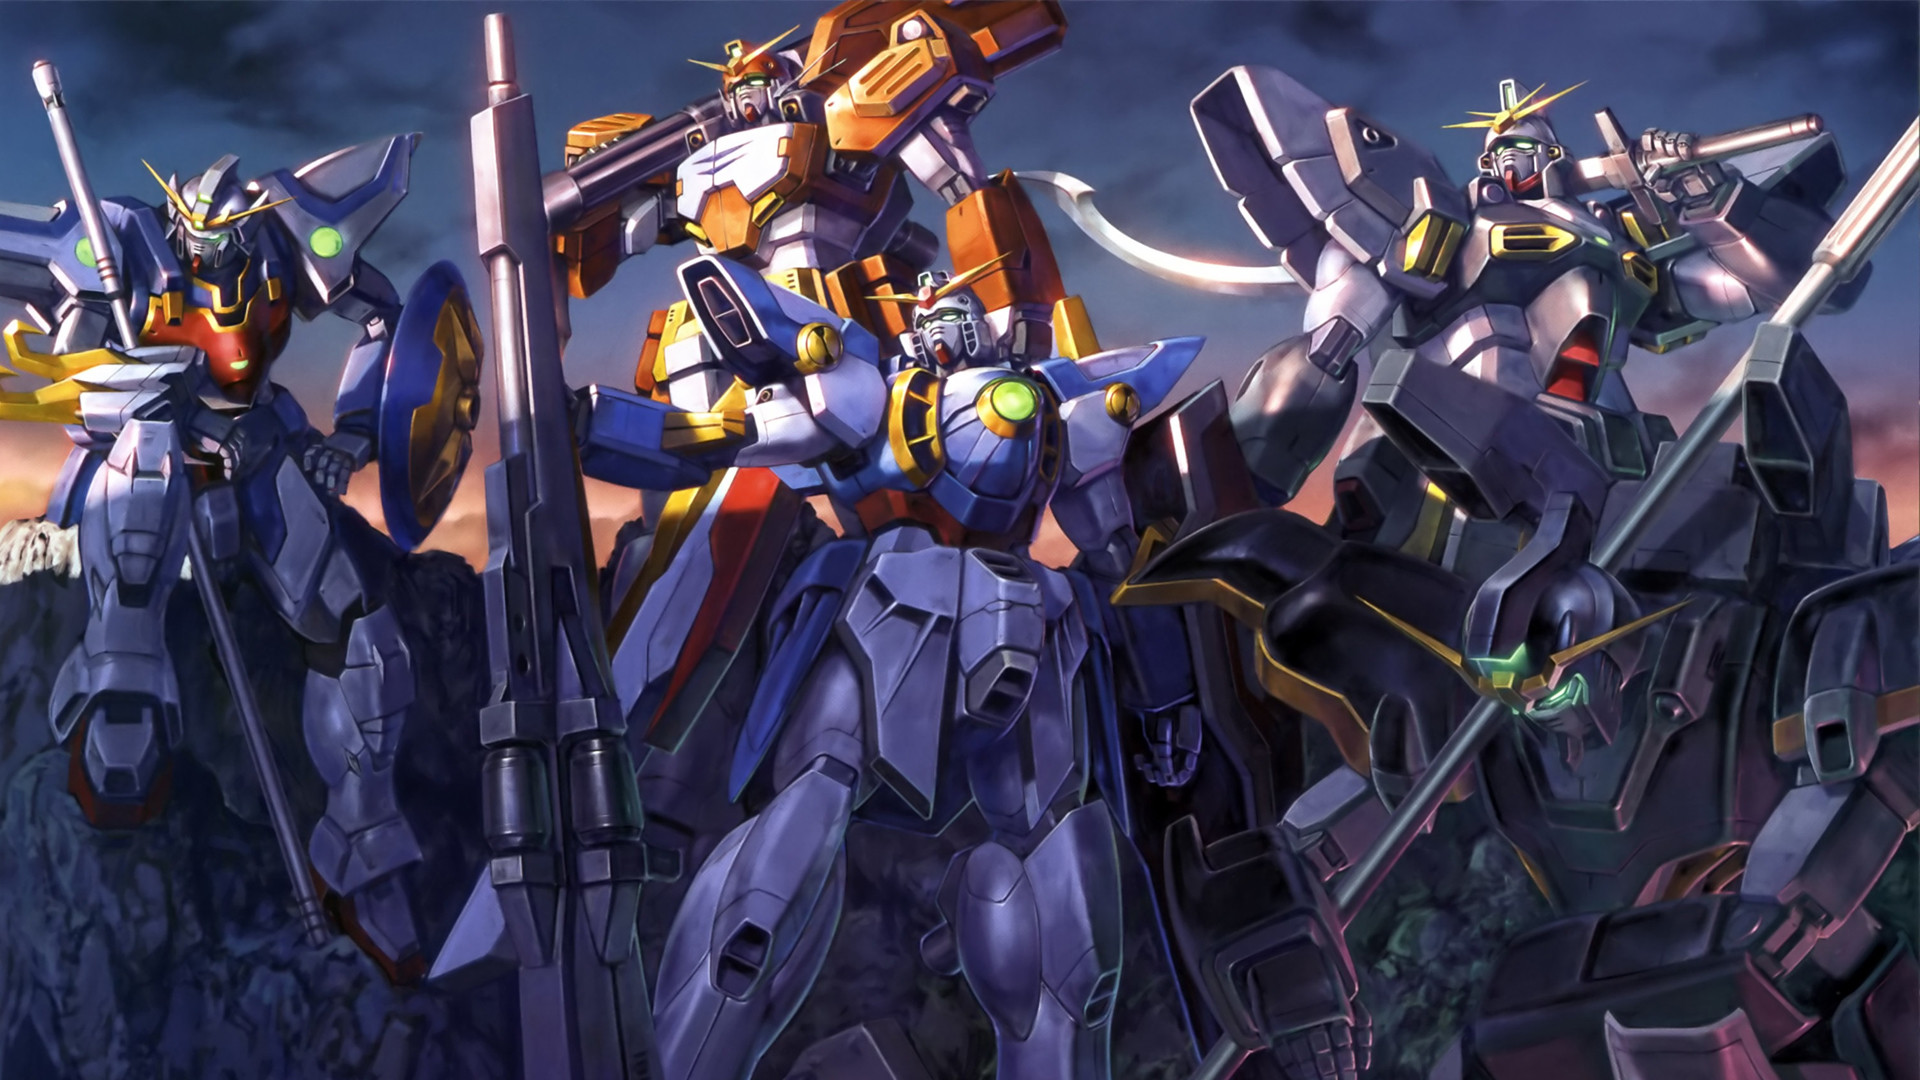 Anime HD Wallpaper : Japanese